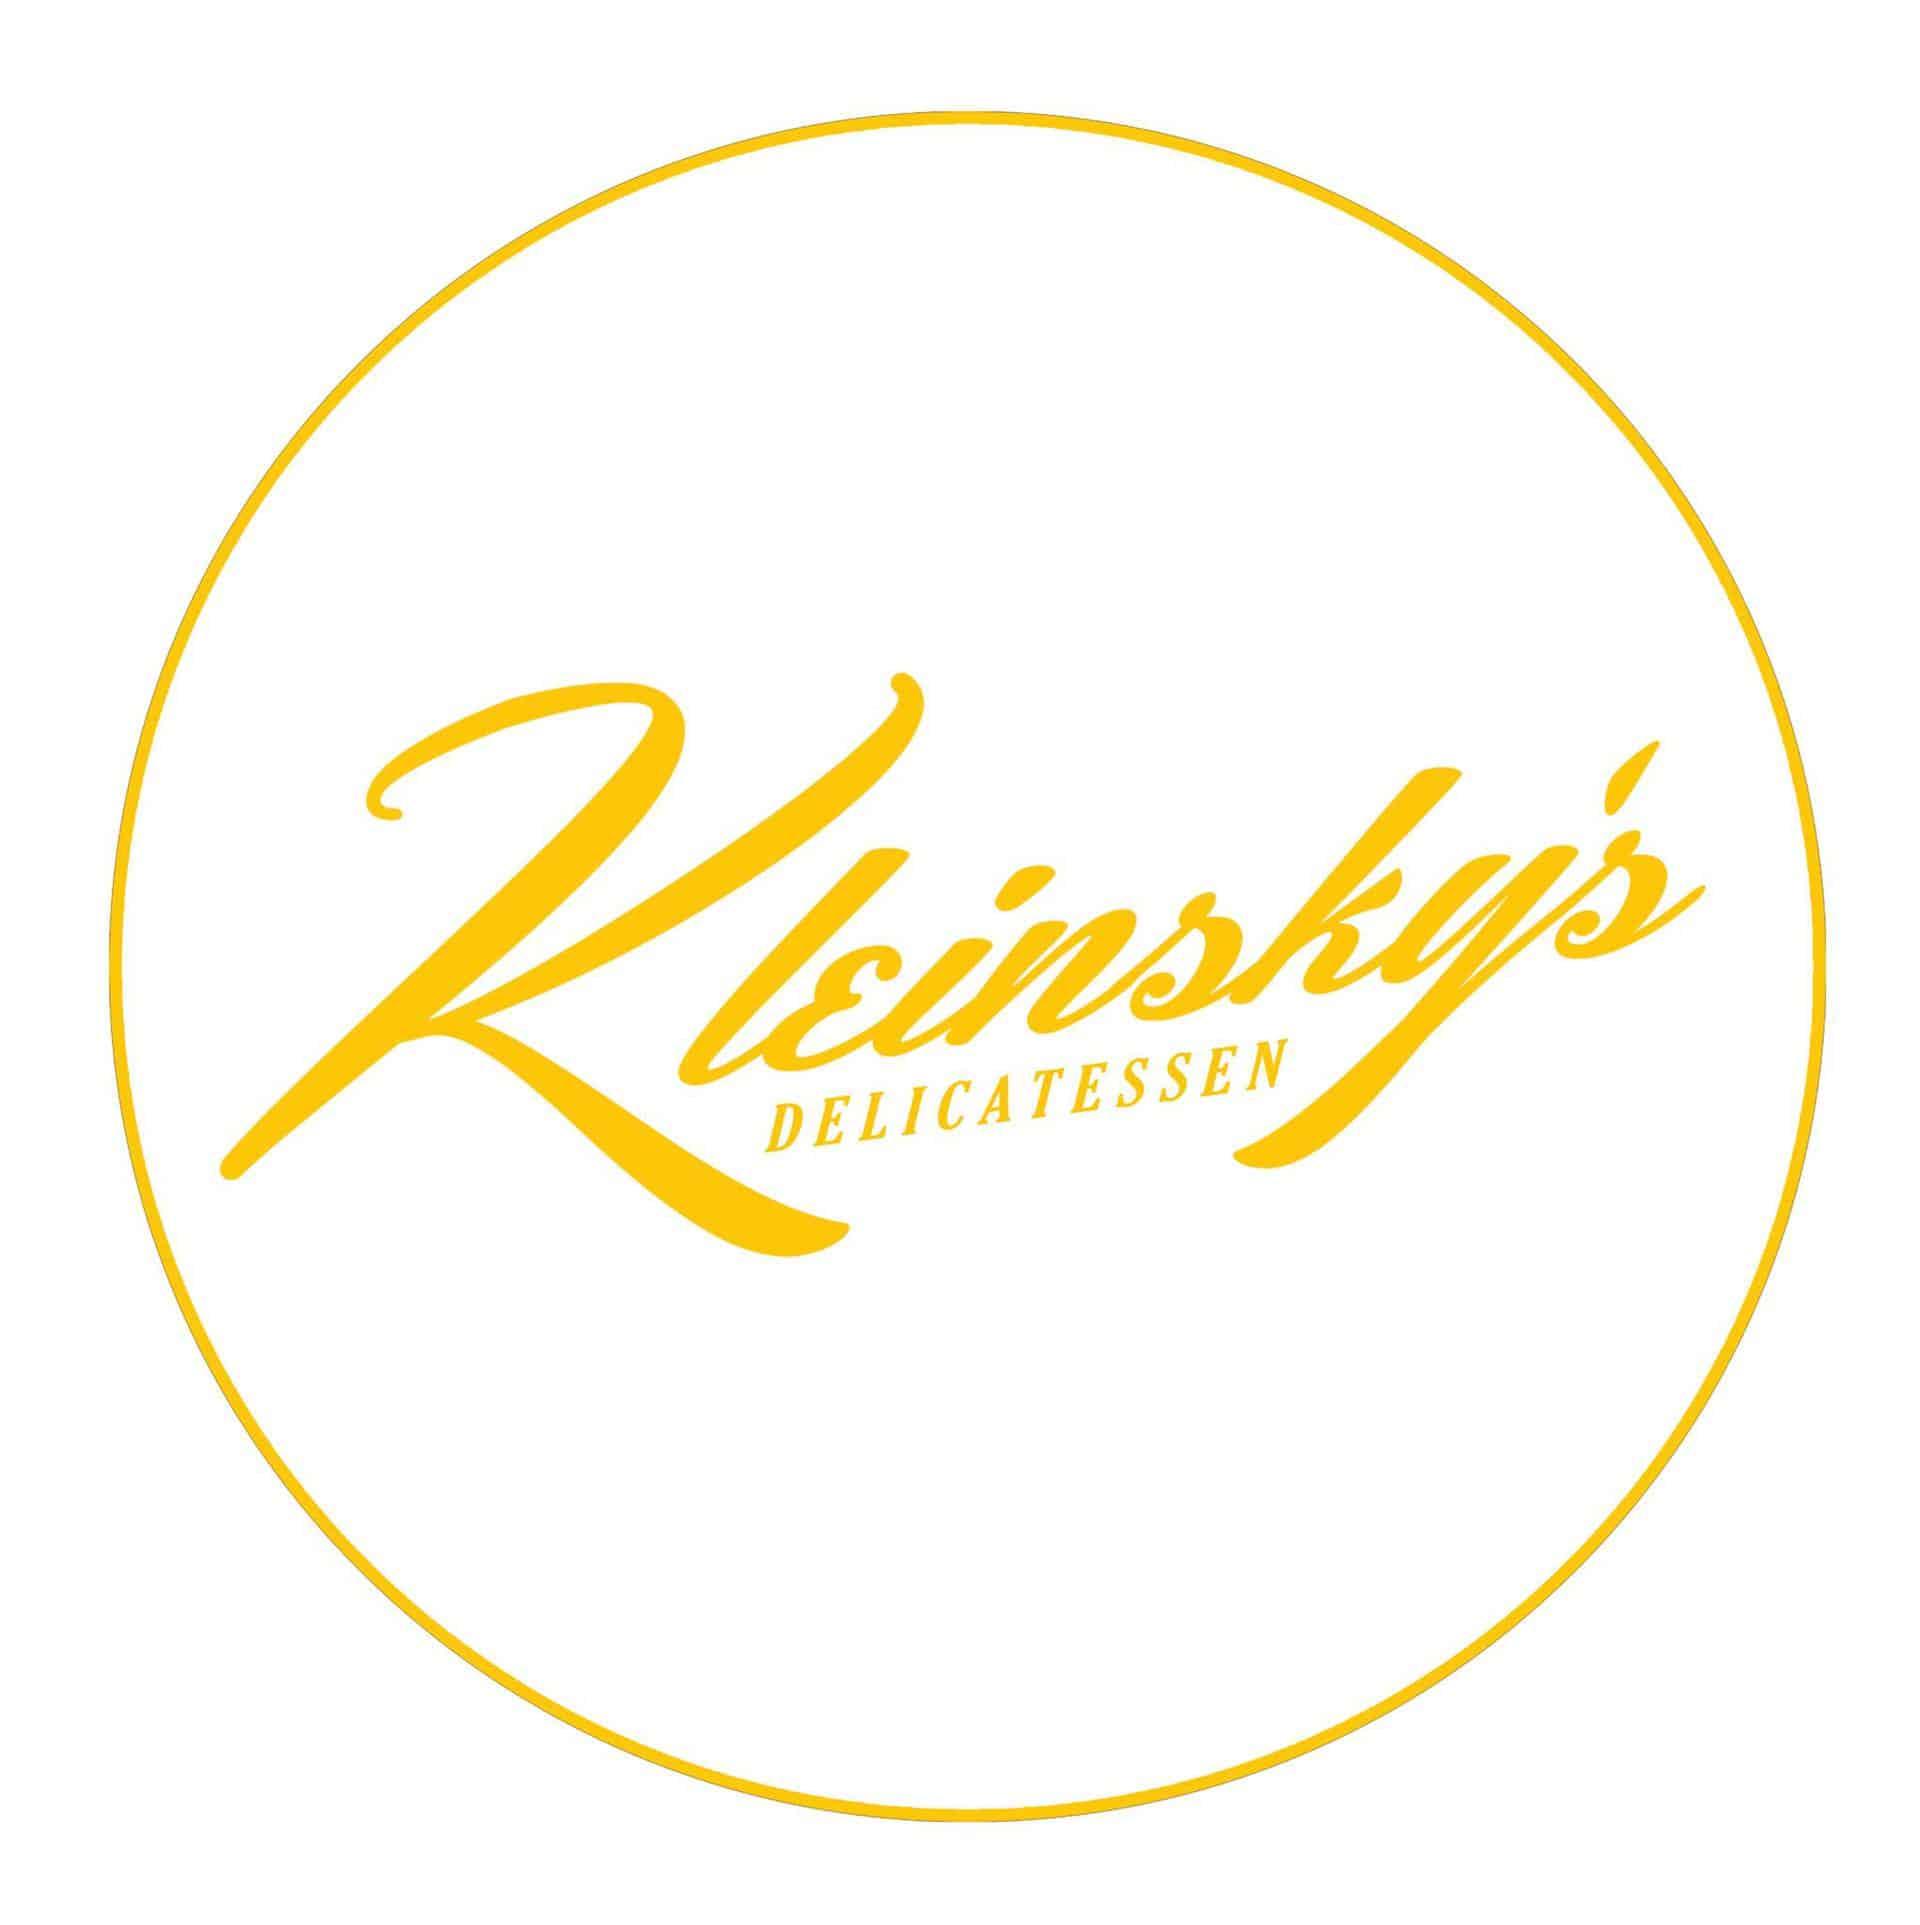 Kleinskys